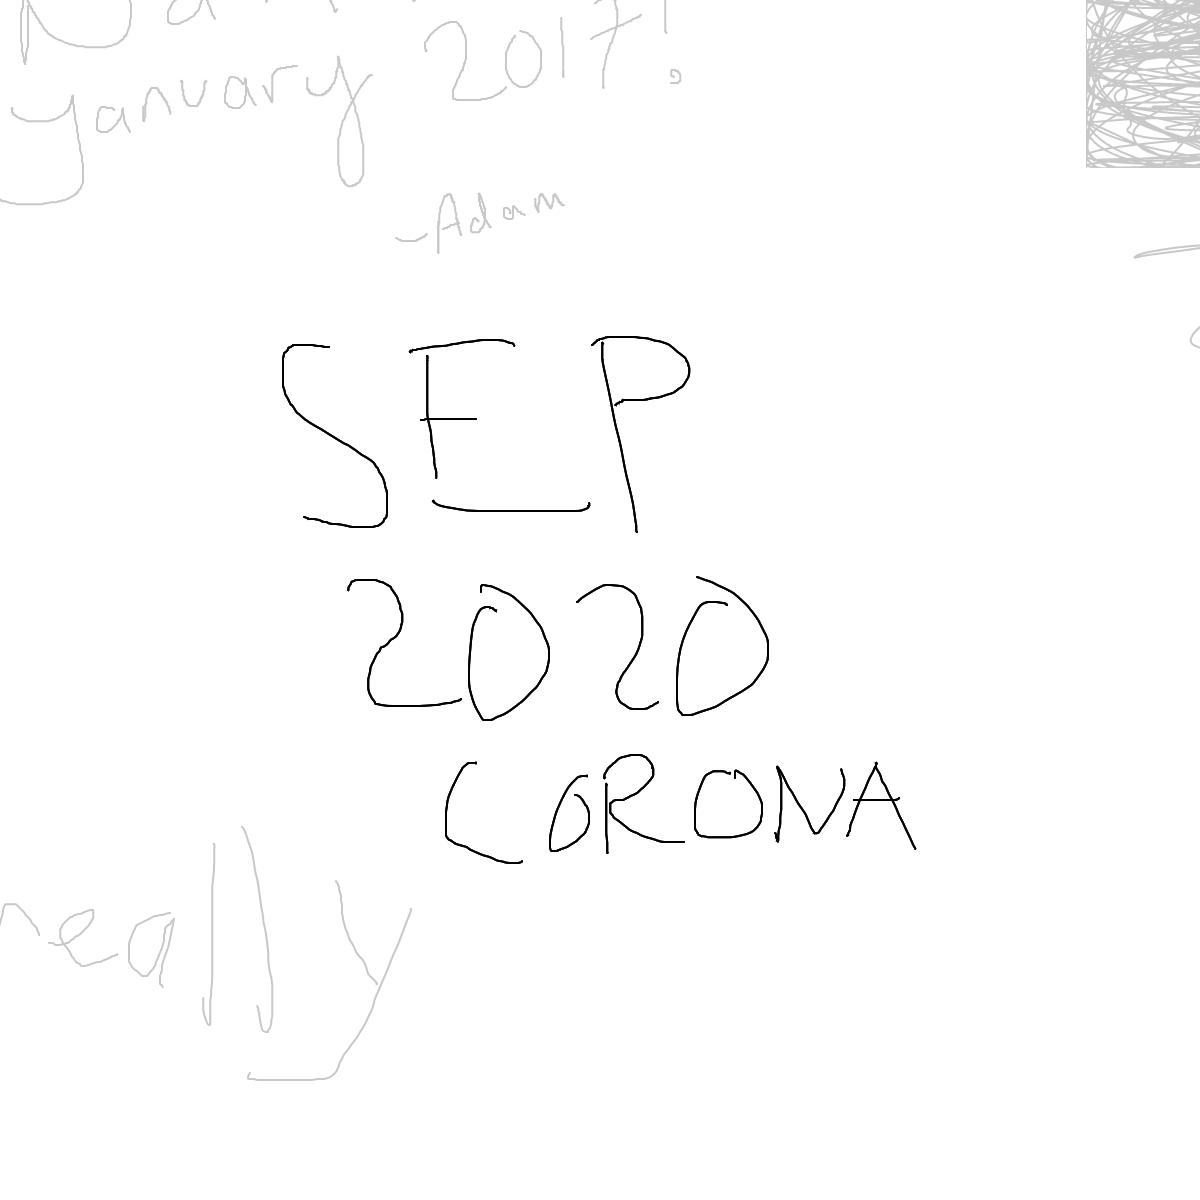 BAAAM drawing#24616 lat:52.4748306274414060lng: 13.4072313308715820